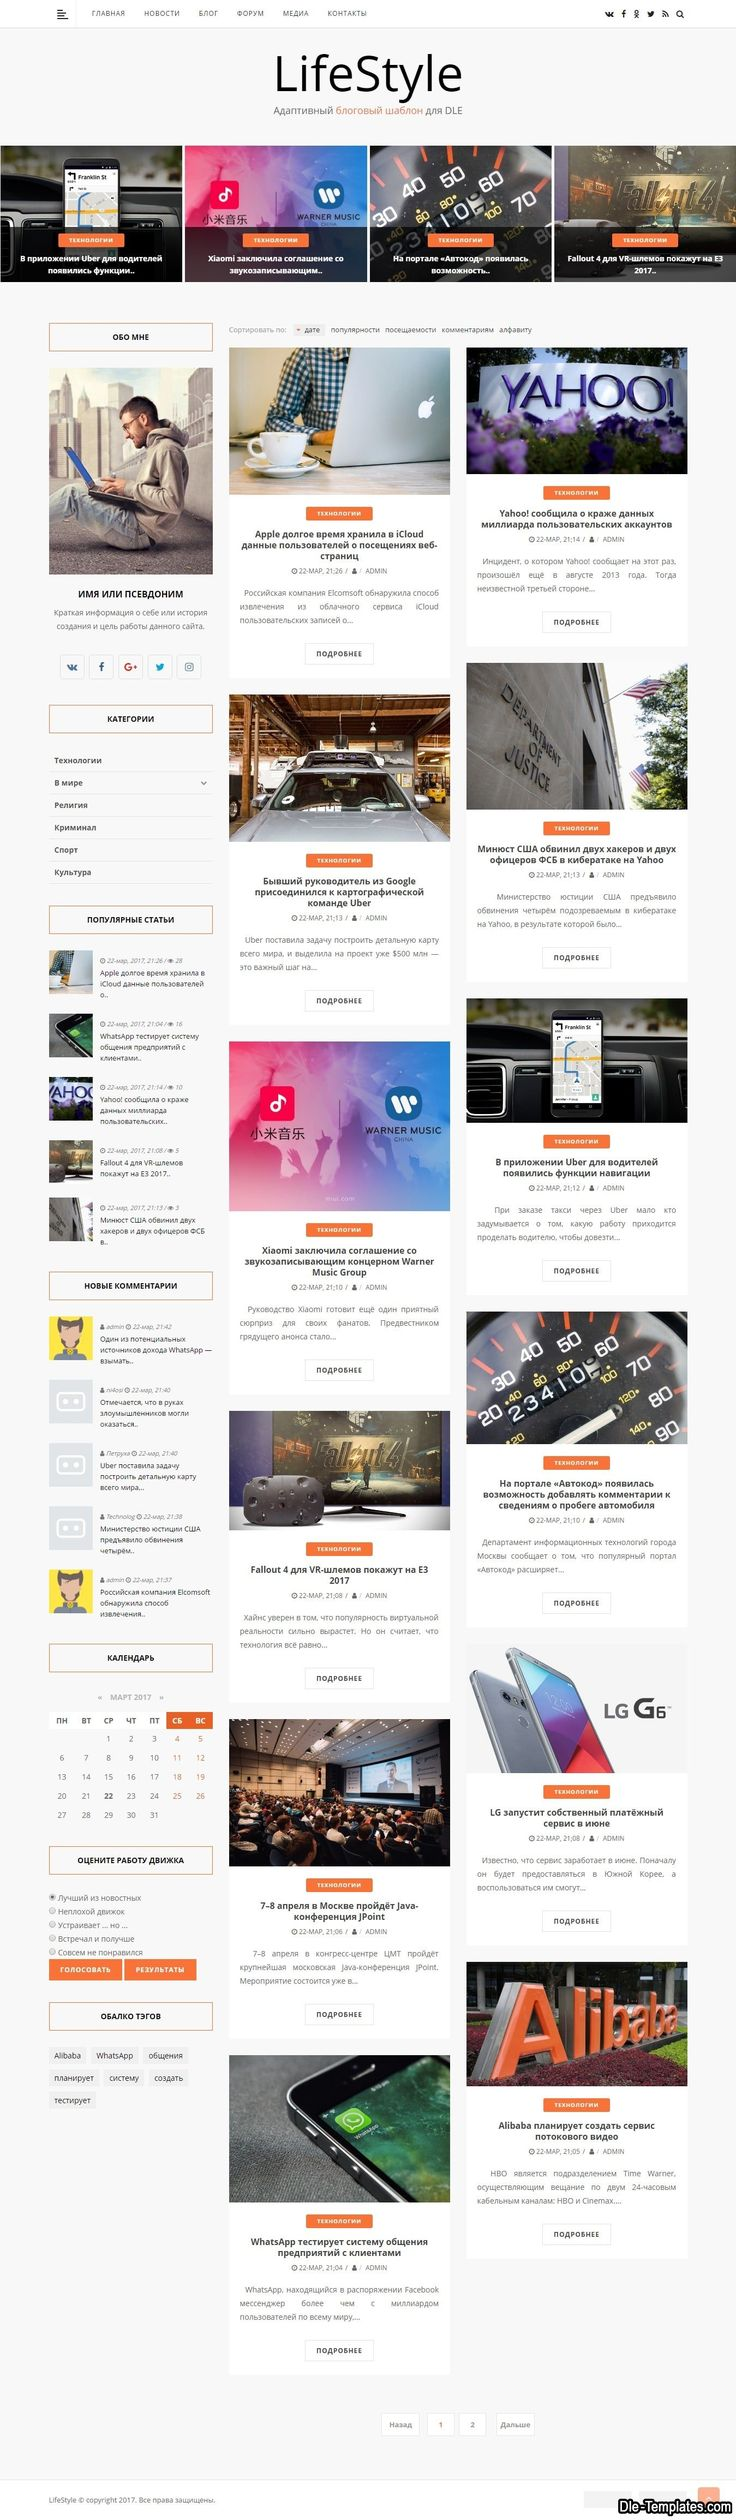 LifeStyle - адаптивный блоговый шаблон для DLE #templates #website #шаблон #сайт #web